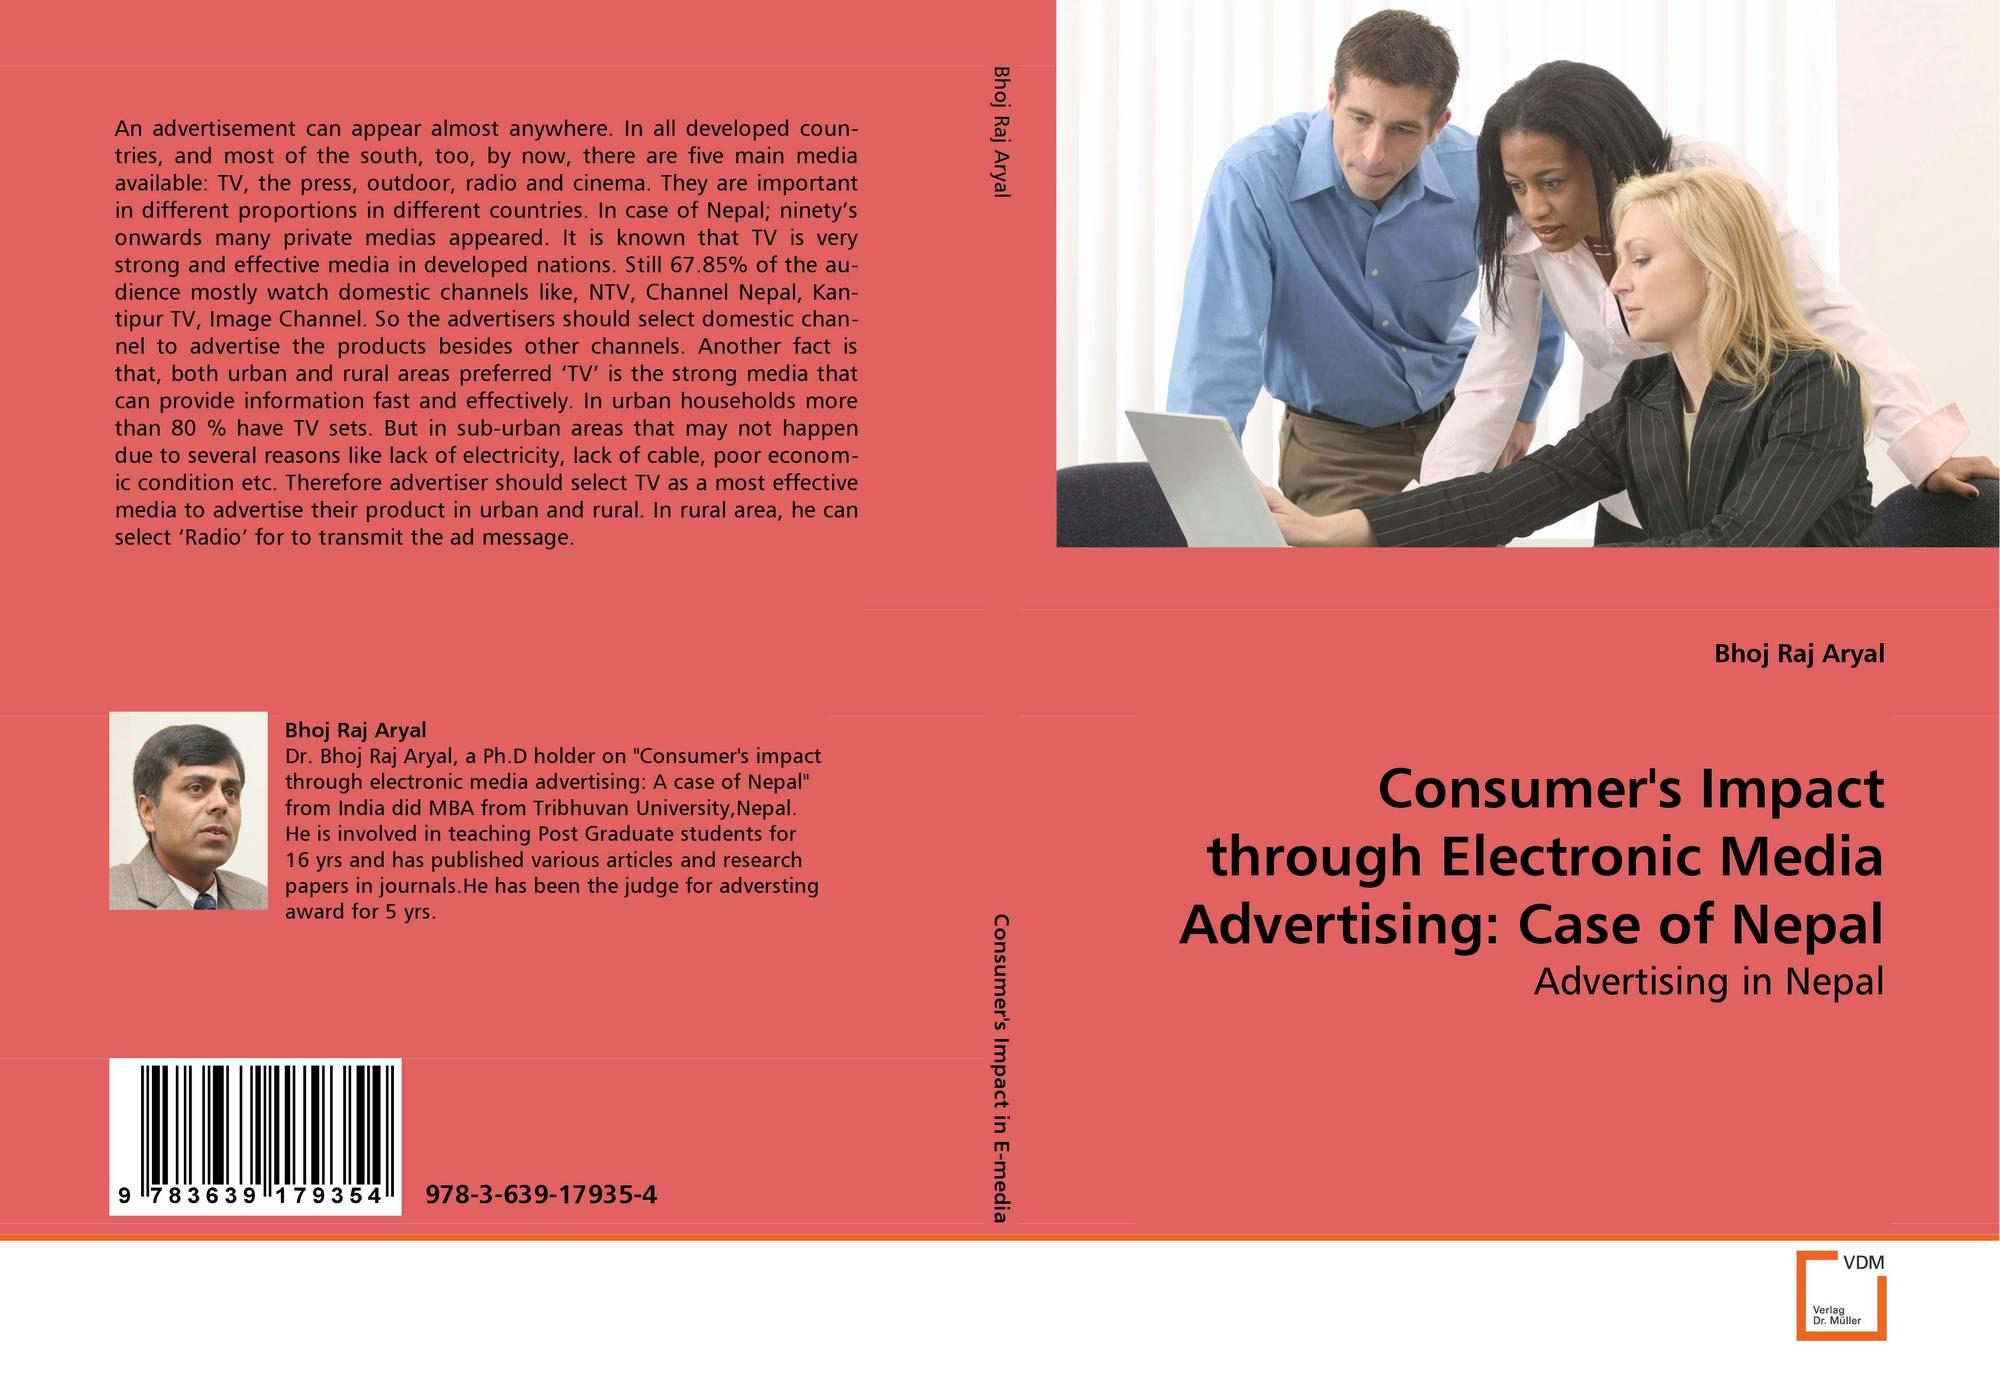 types of electronic media